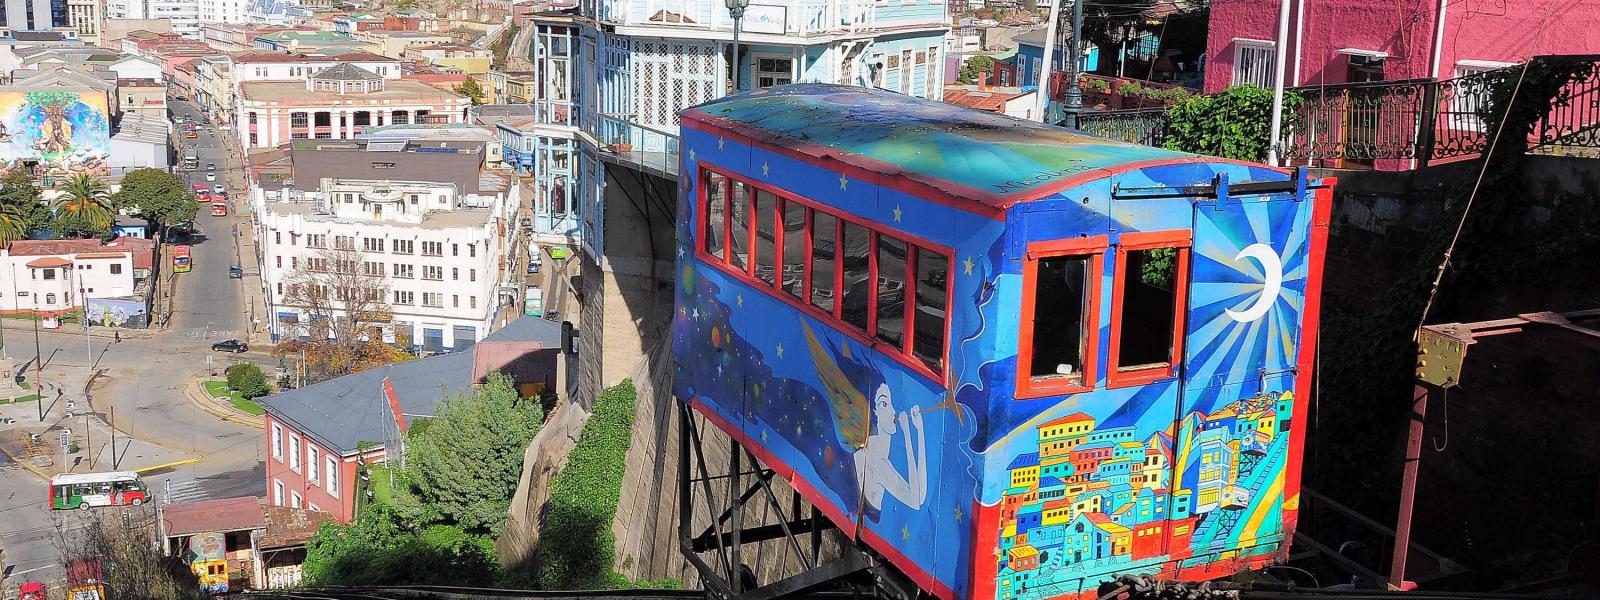 Valparaiso-Tour-Guide